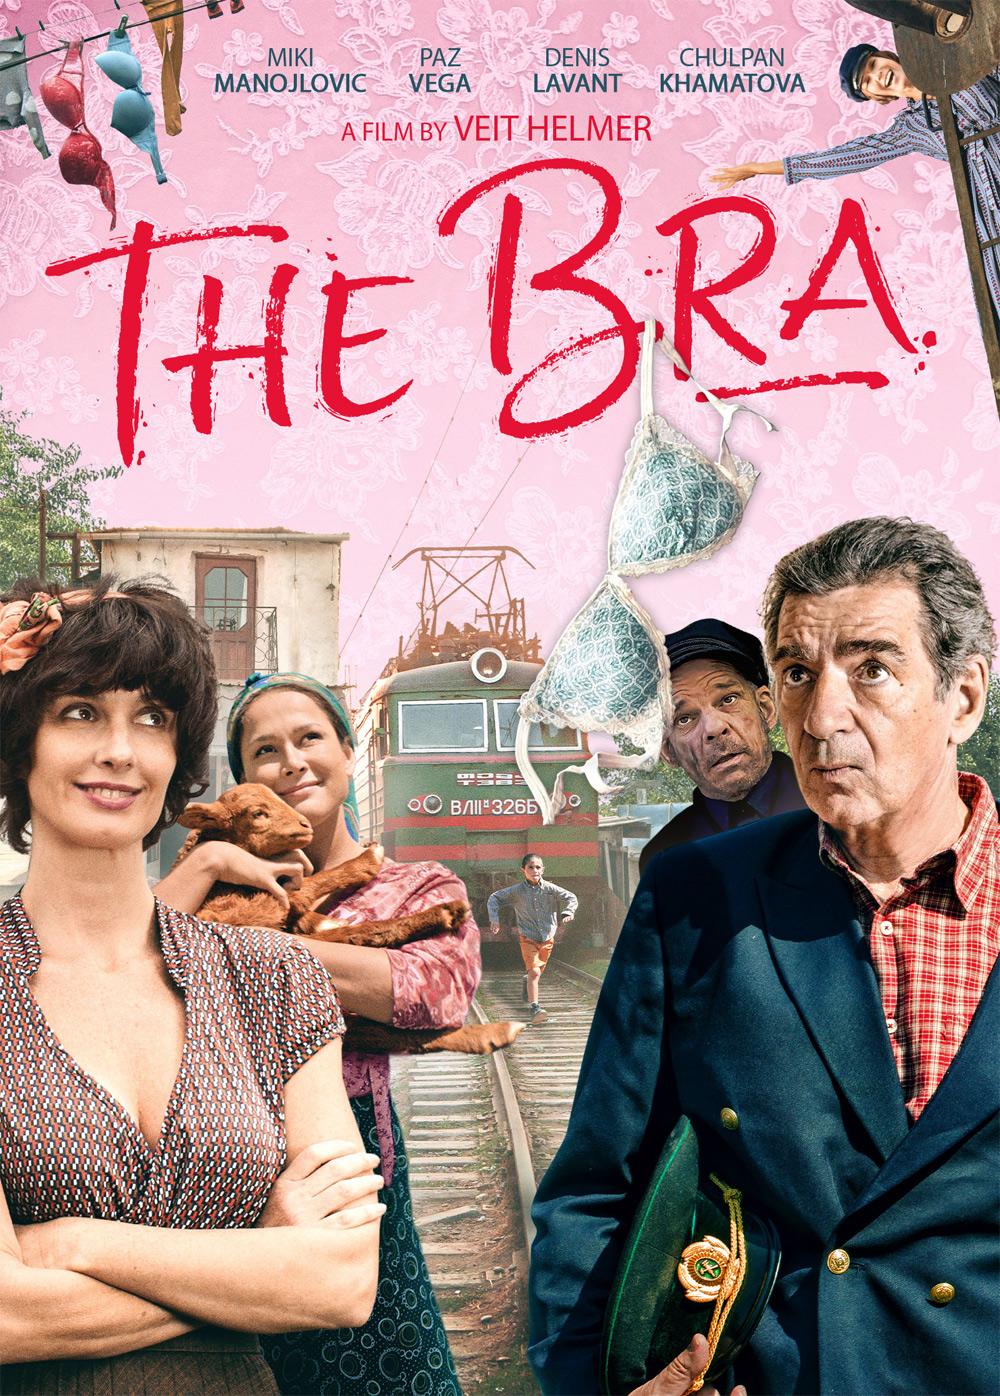 The Bra Poster